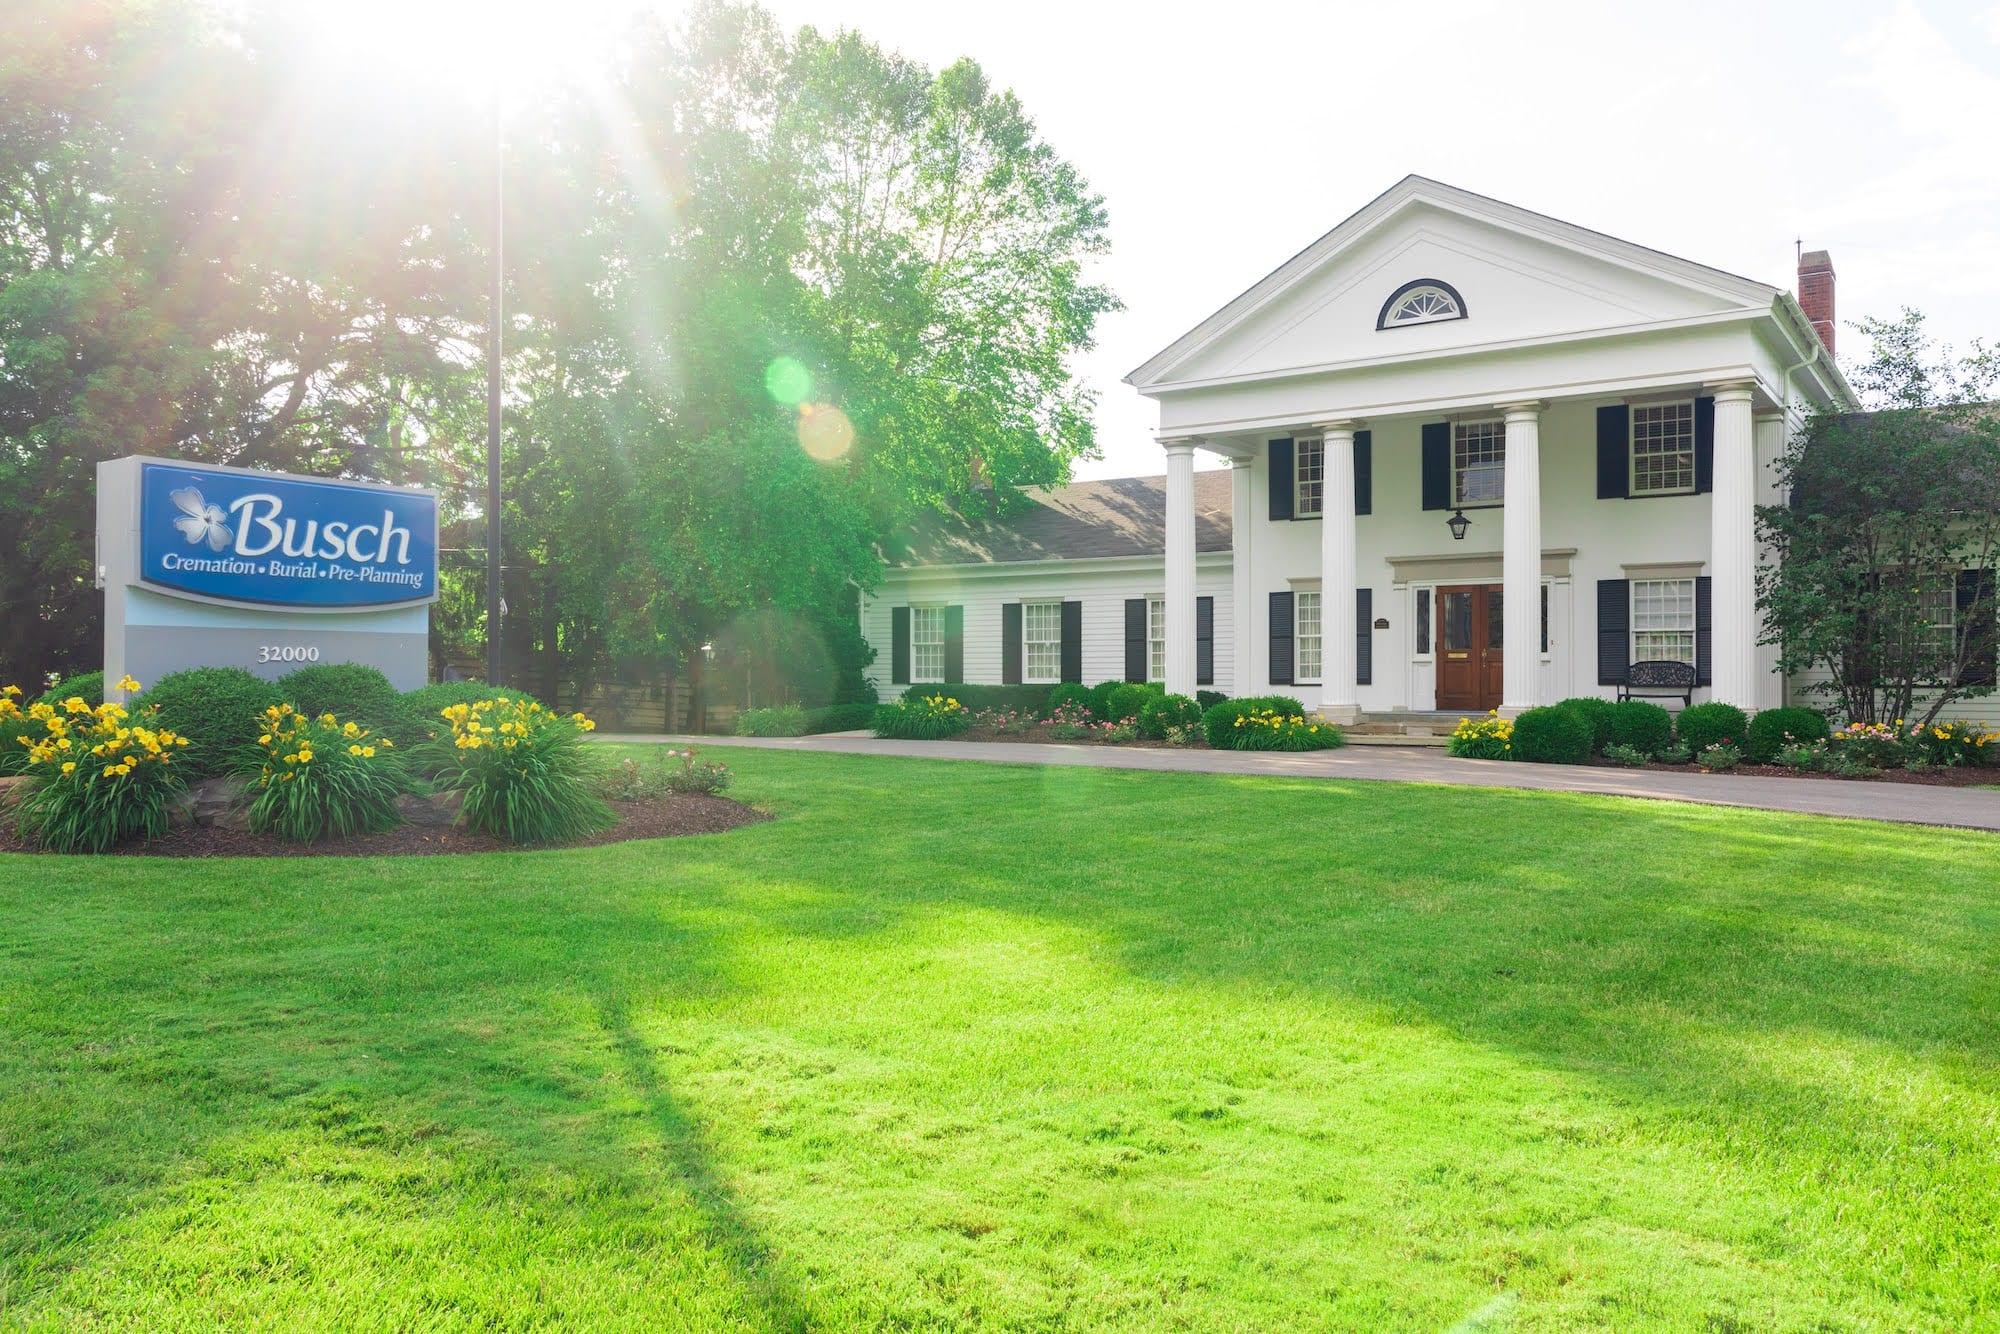 Avon - Busch Funeral Home4